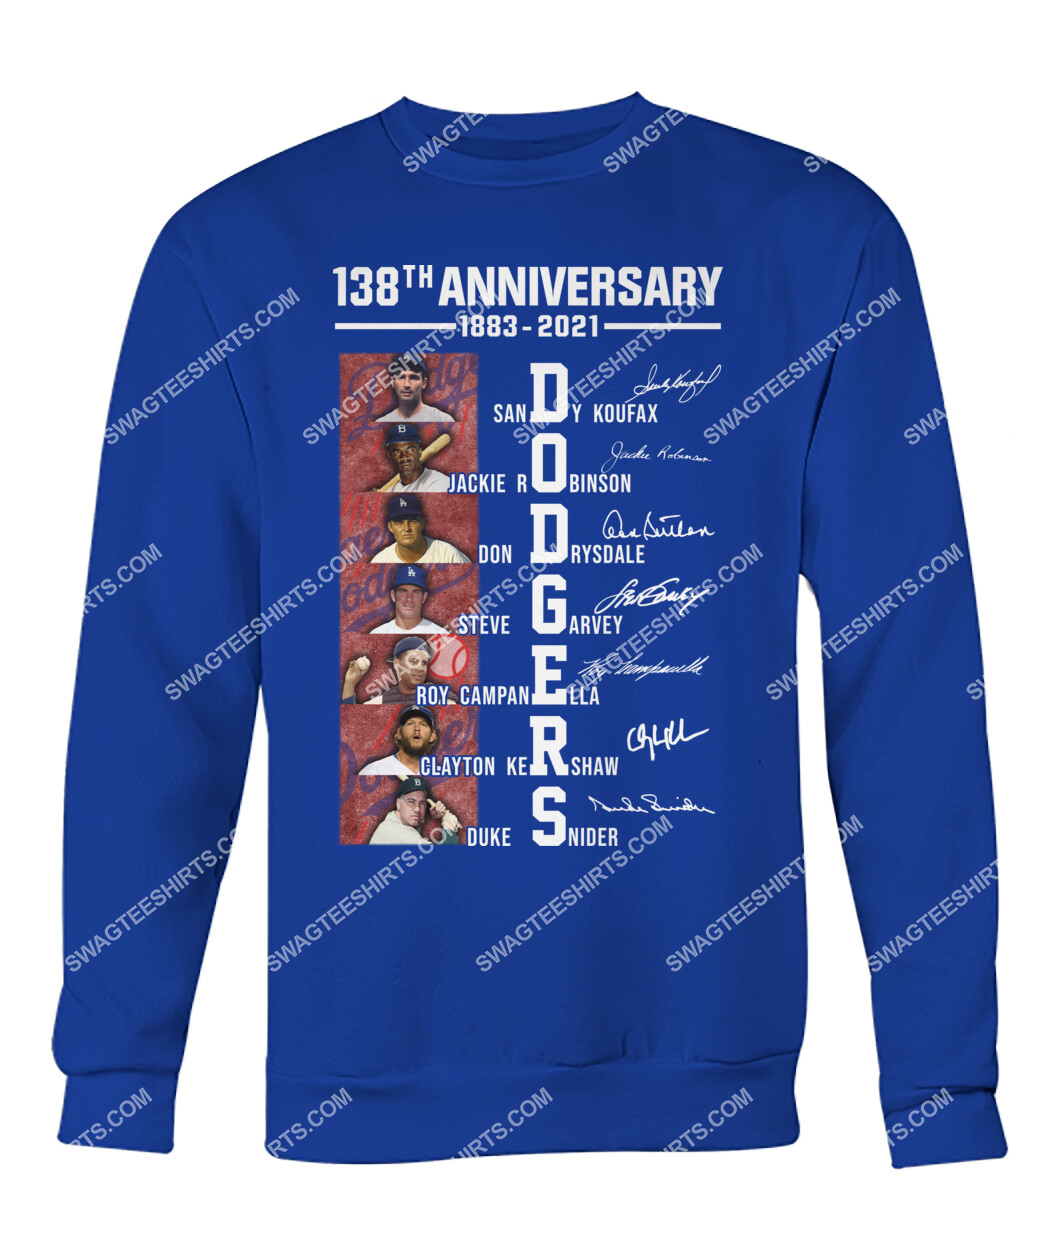 the los angeles dodgers 138th anniversary 1883 2021 signatures mlb sweatshirt 1